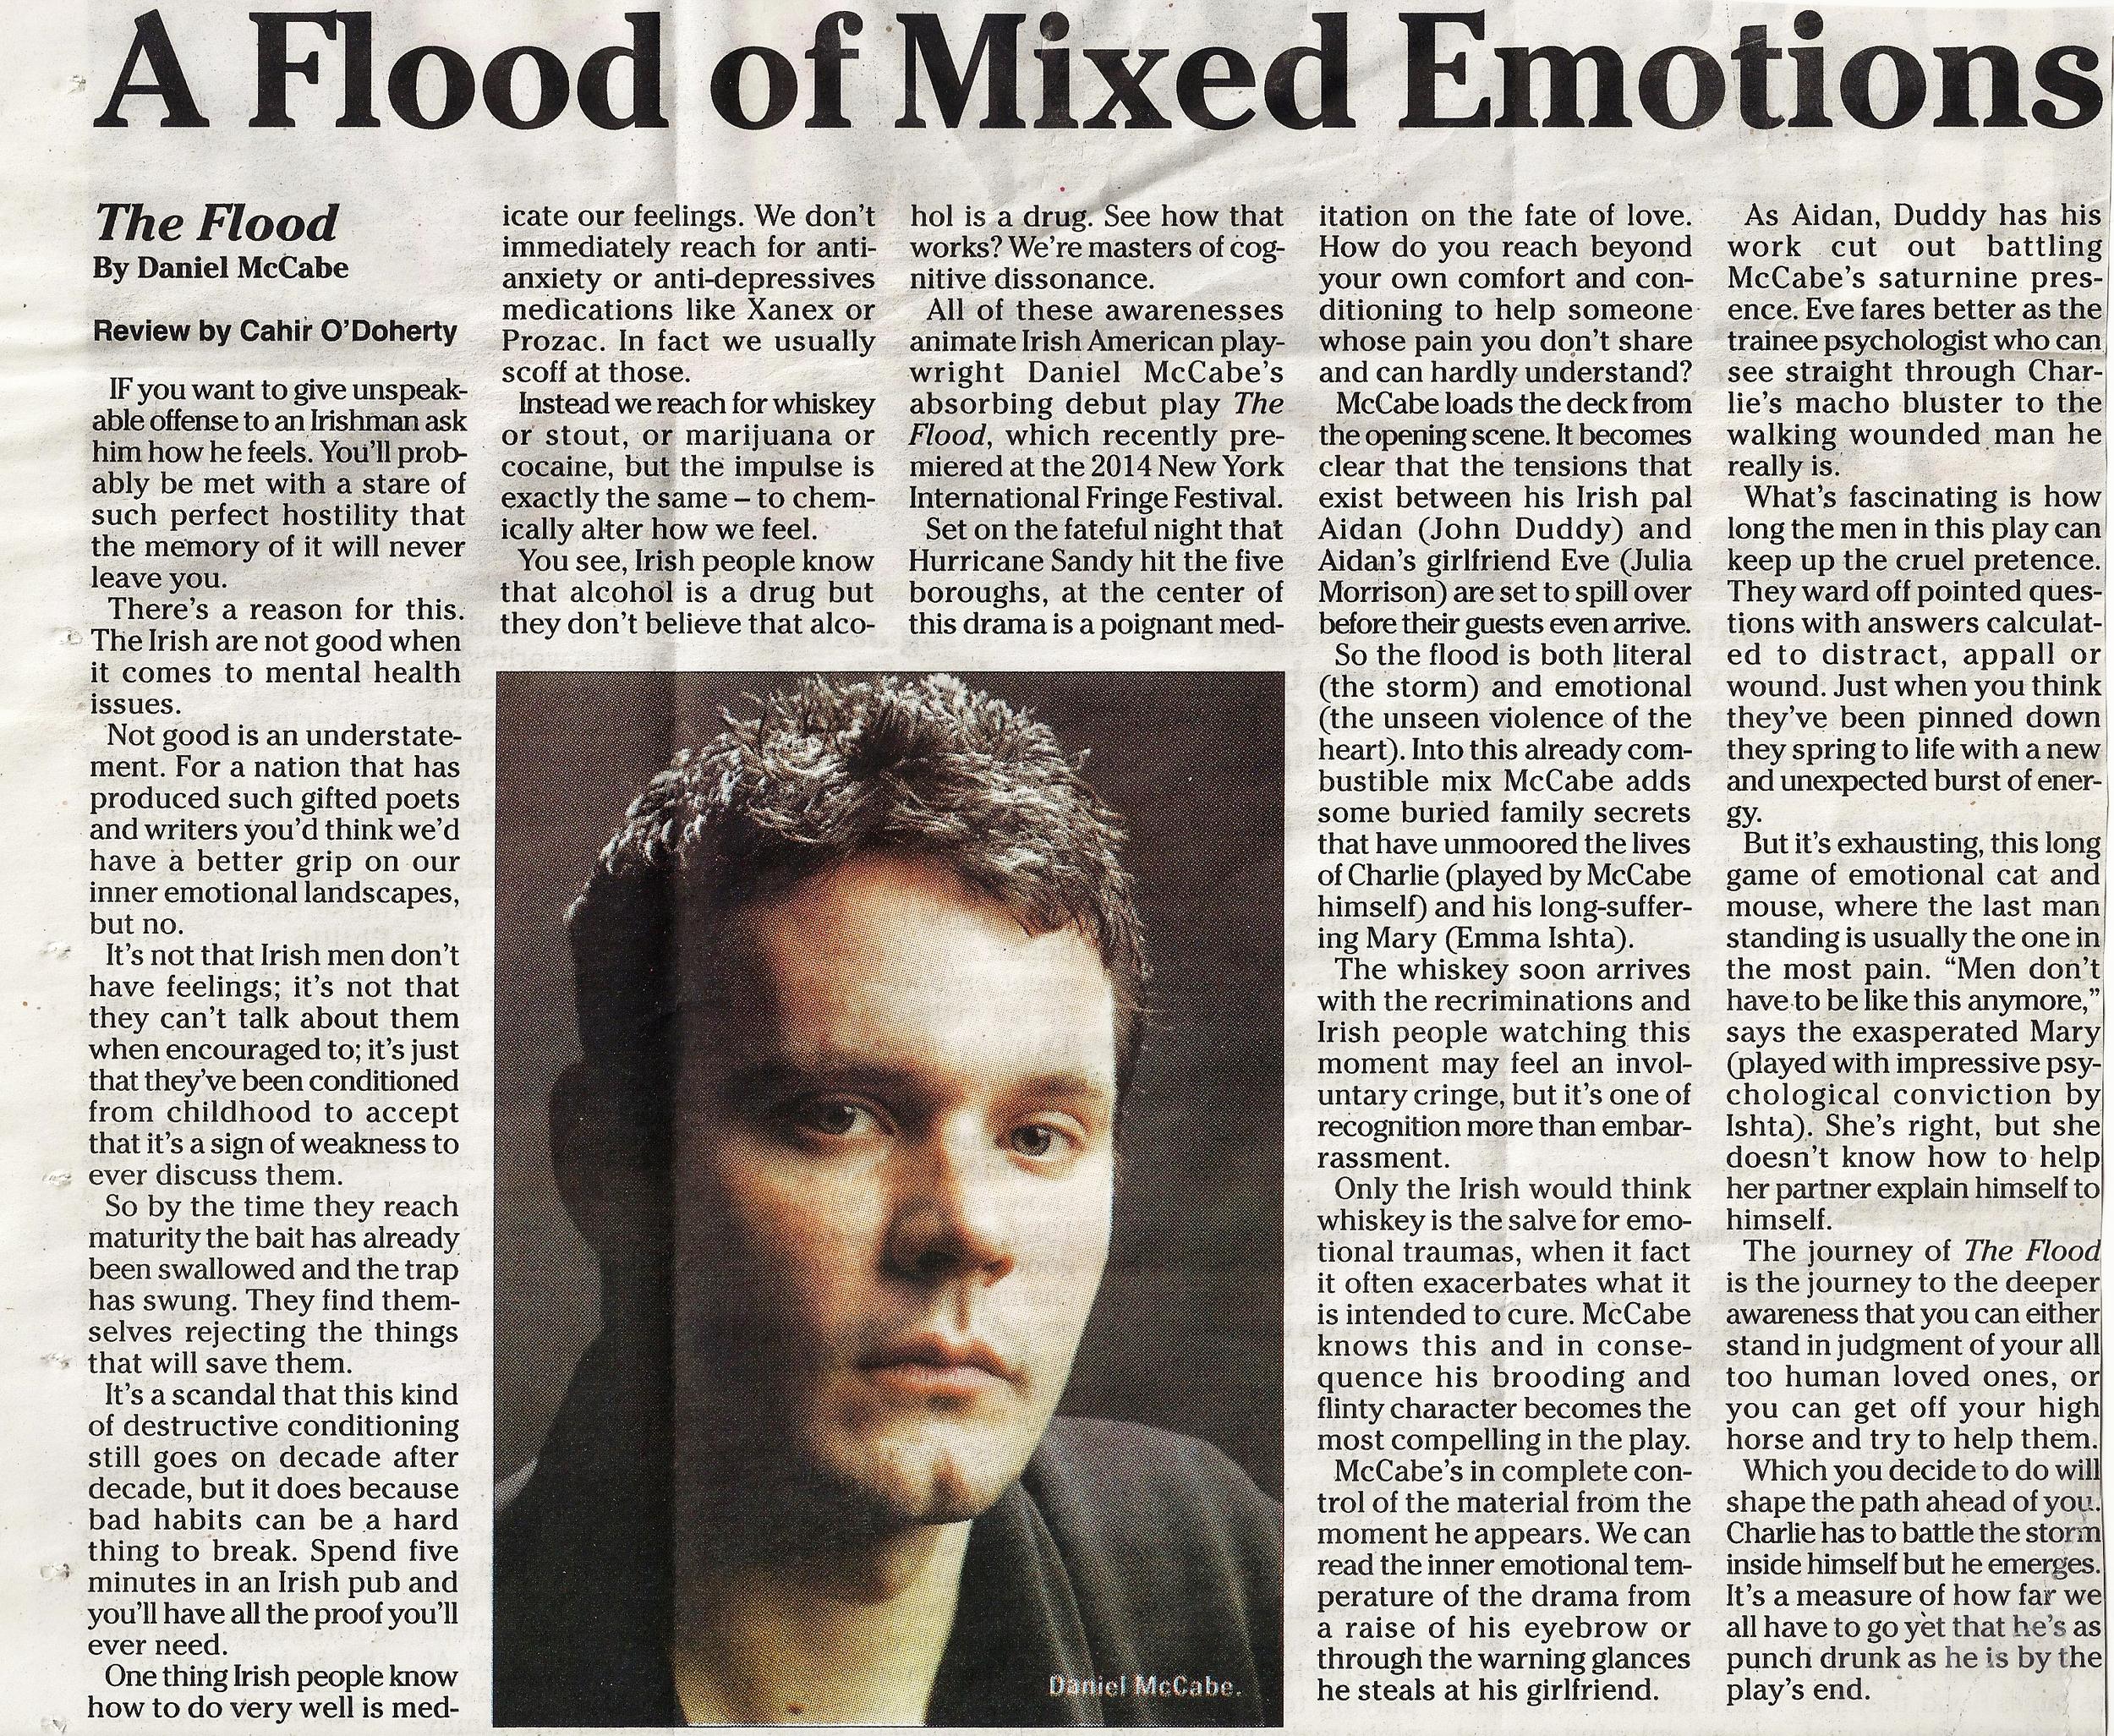 Cahir O'Doherty for The Irish Voice newspaper.